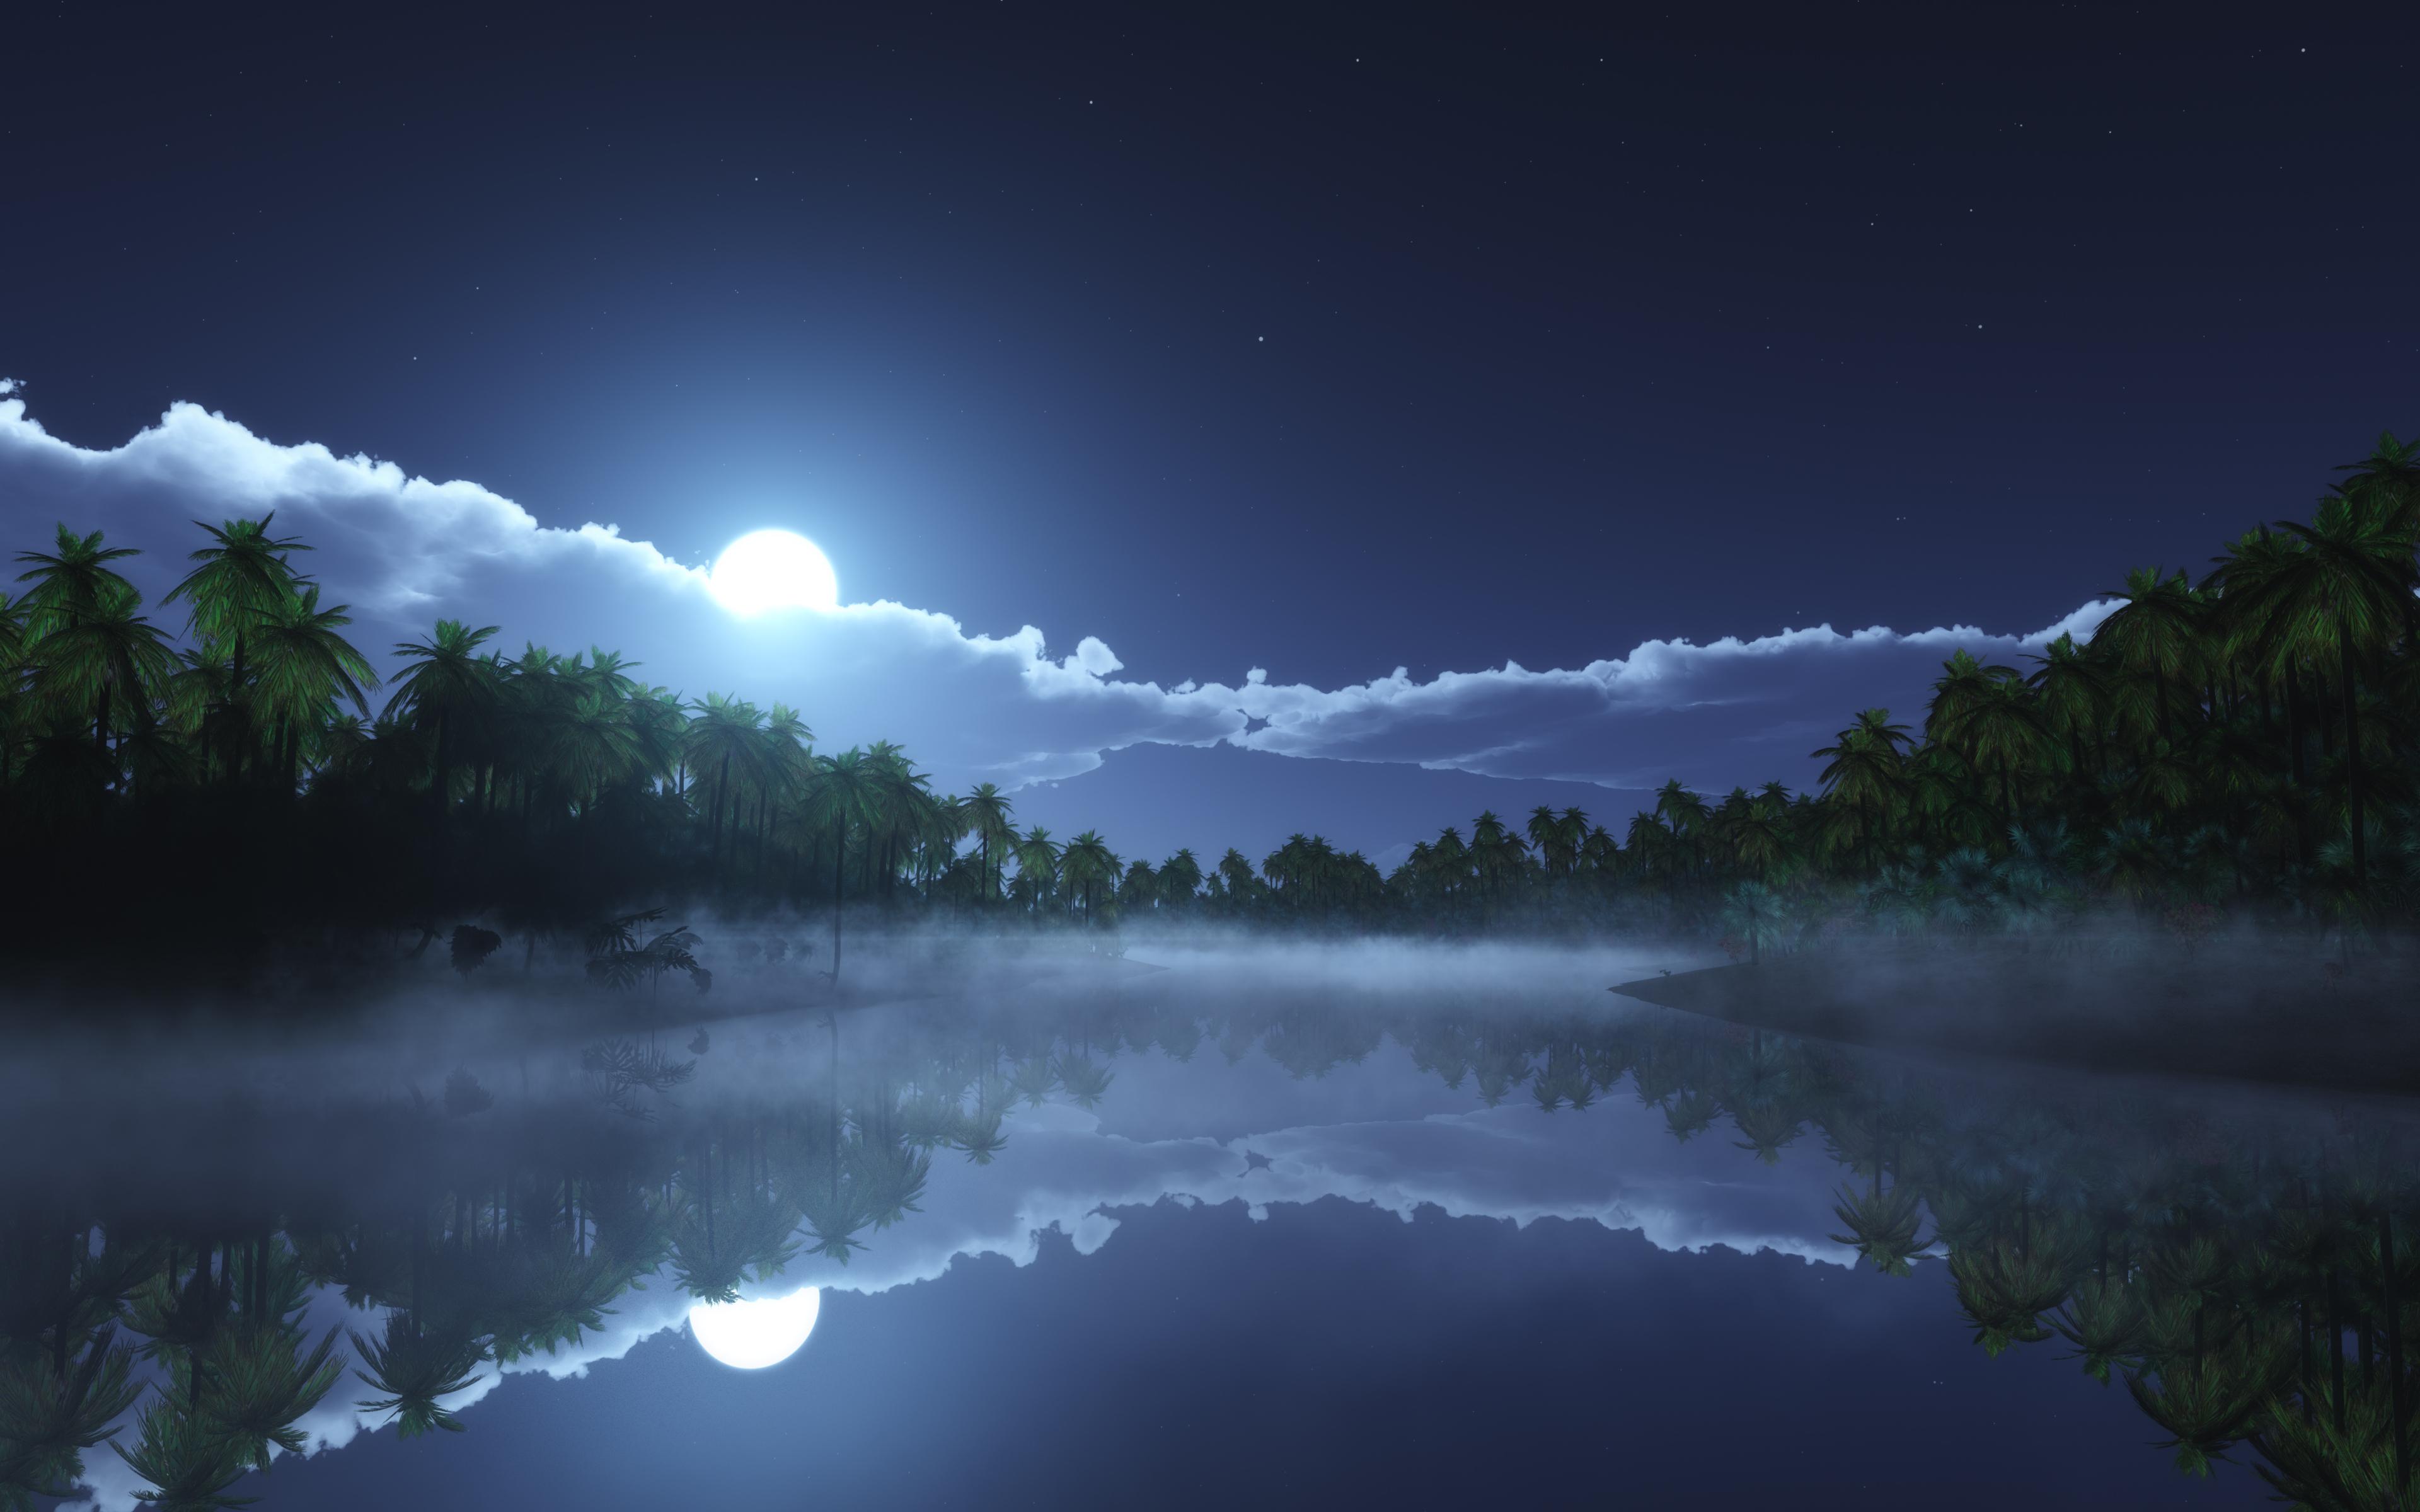 tropic-cold-night-4k-jn.jpg